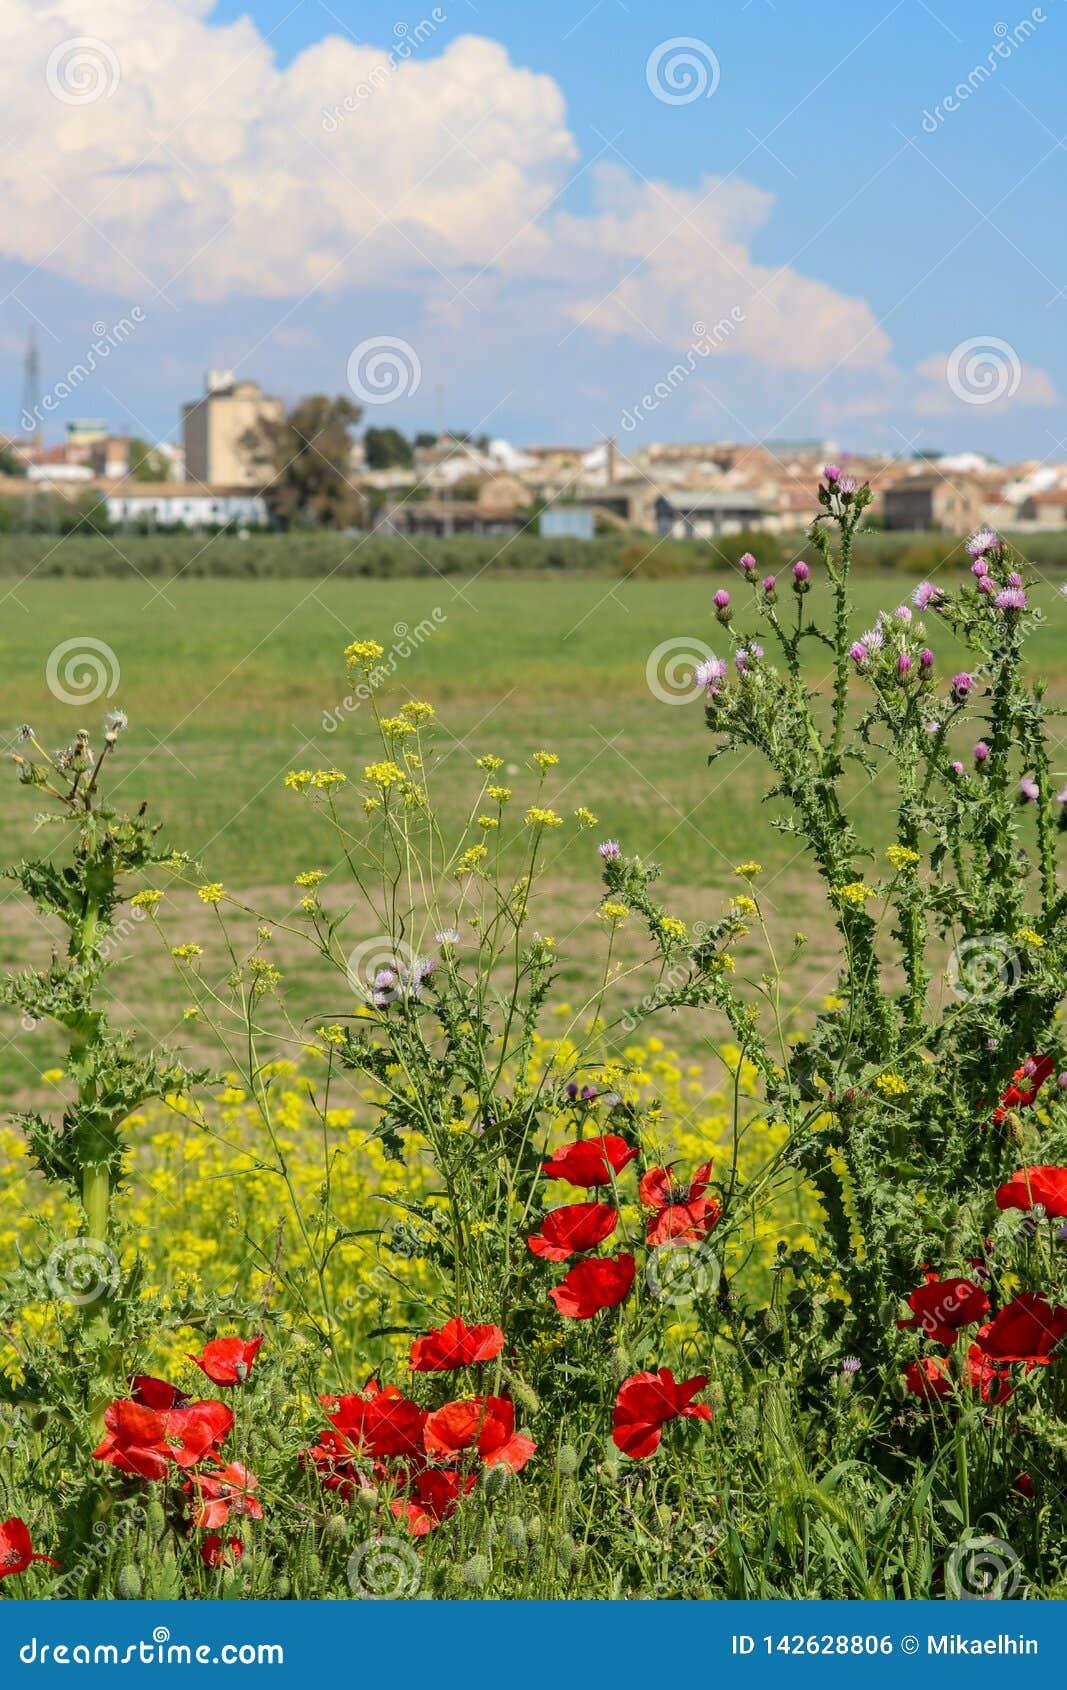 Mohnblumenblumen vor Industriebauten